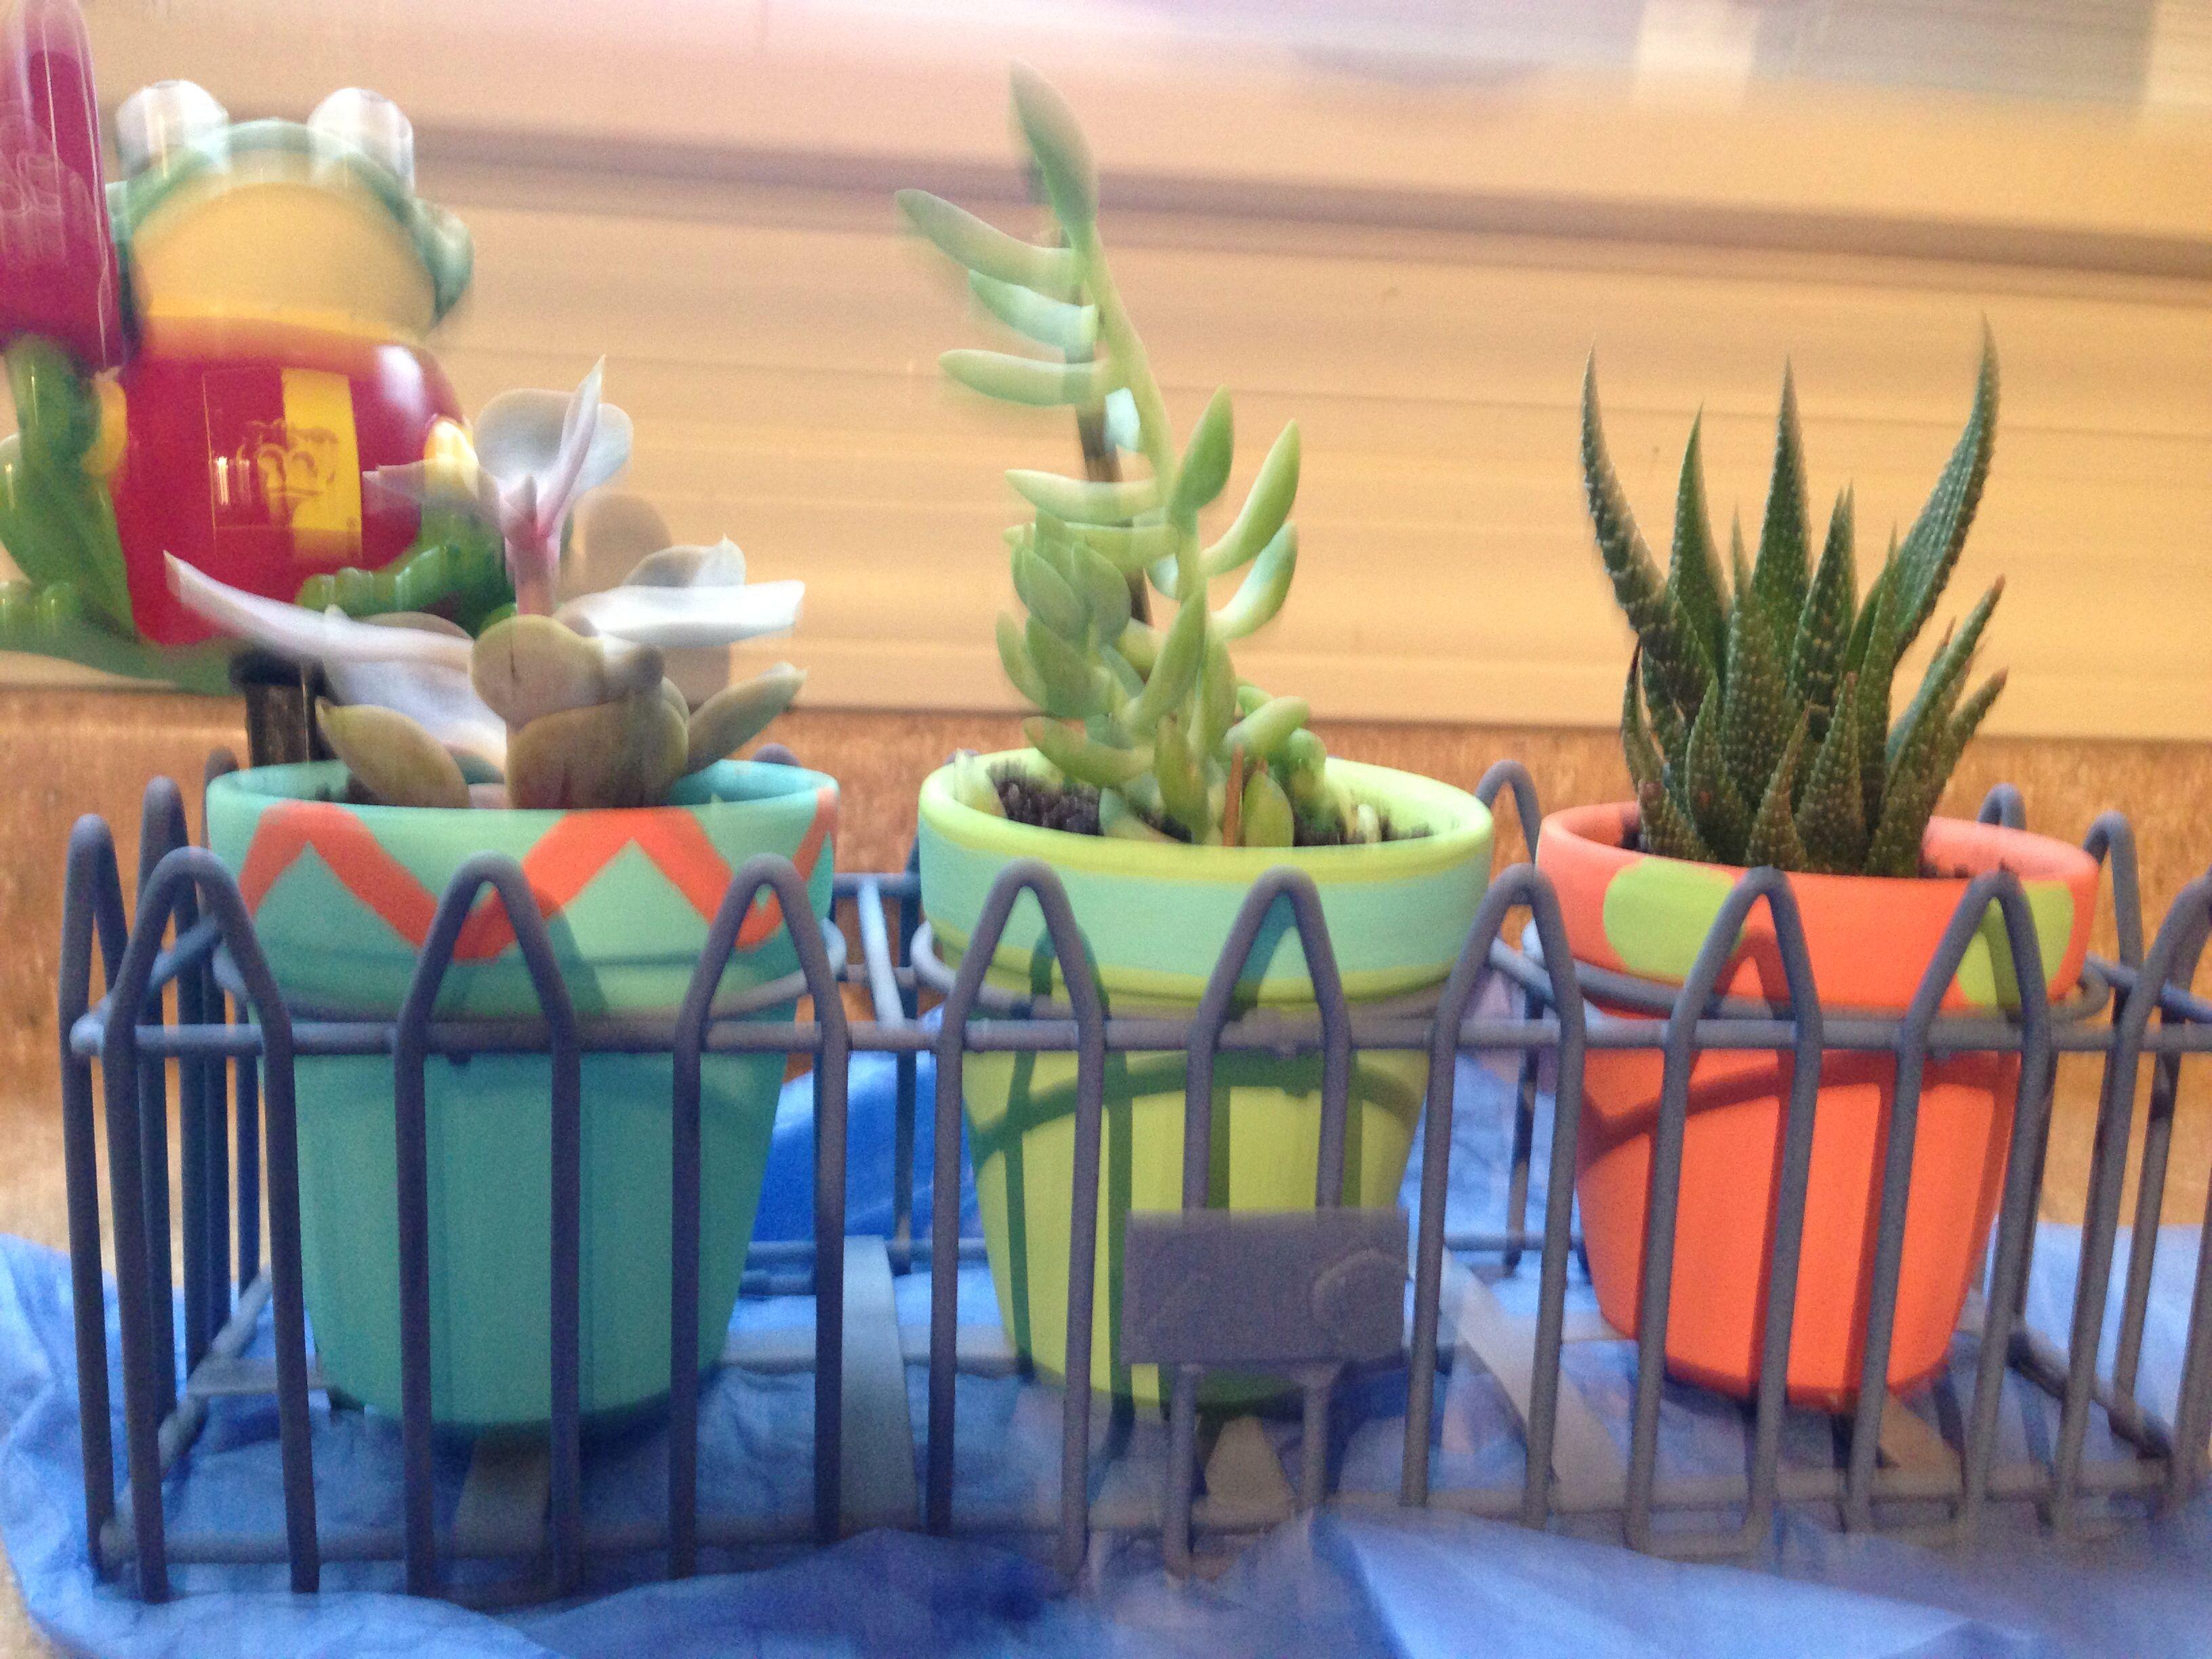 Succulents in clay pots